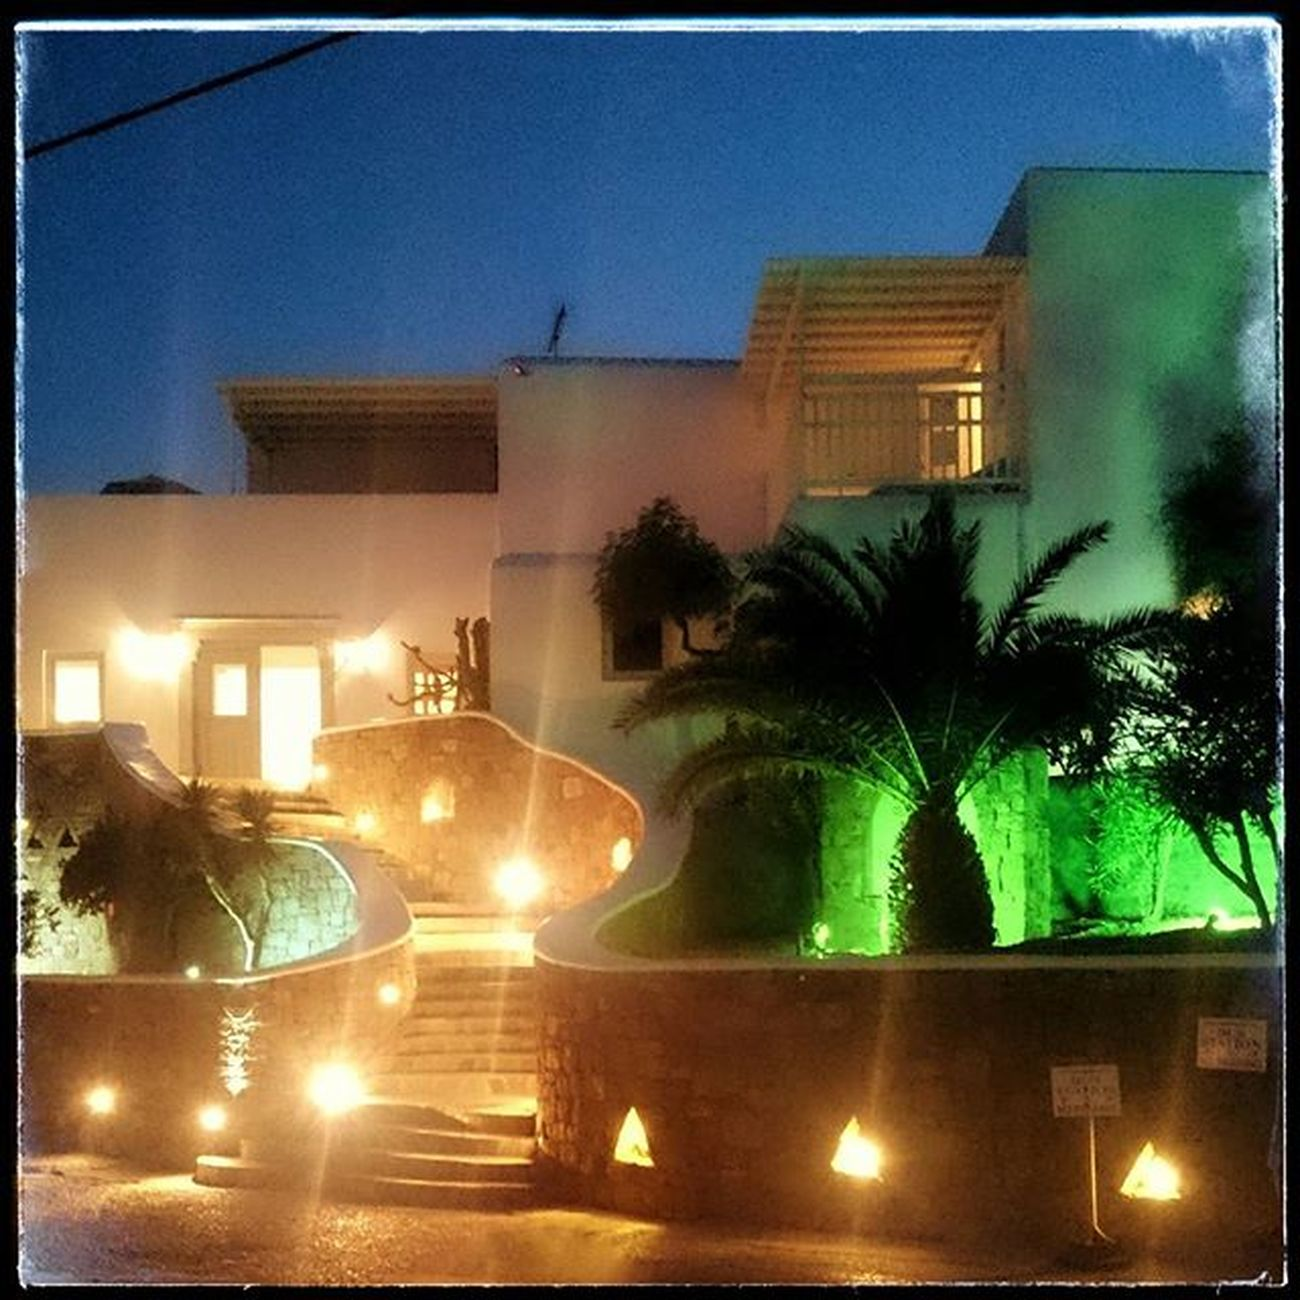 ONLY FOR GOOD EYES. MYKONOS HOTELS, 11.40 PM Mykonos Mykonosbeach Hotel Besthotel Secret Secretescape Light Greekholidays Greekisland Cyclades_islands Cyclades Cicladi Vacanzeingrecia Enjoy Party Gotomykonos Scandinavian Green Greecestagram Greece